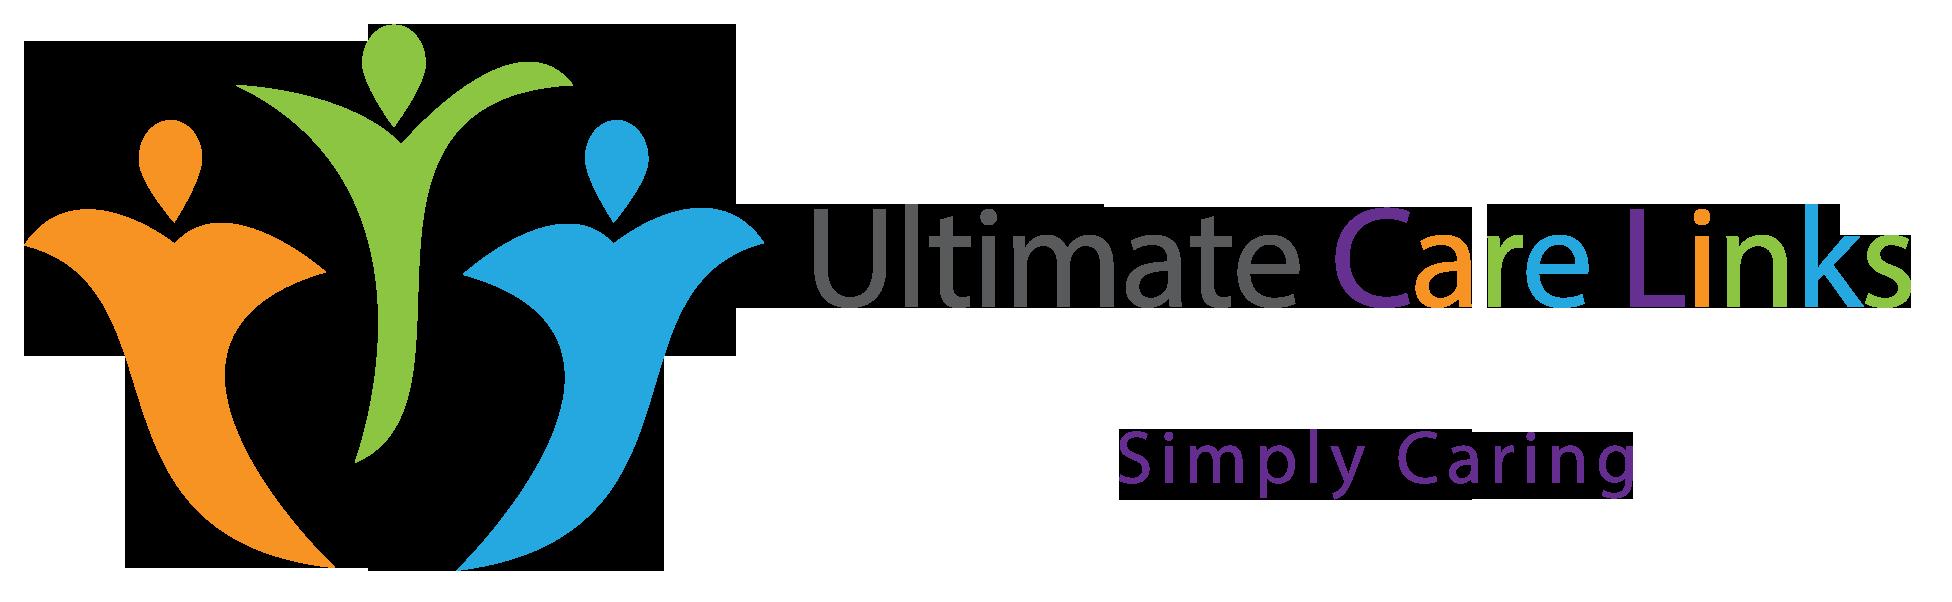 Ultimate-Care-Links-Logo